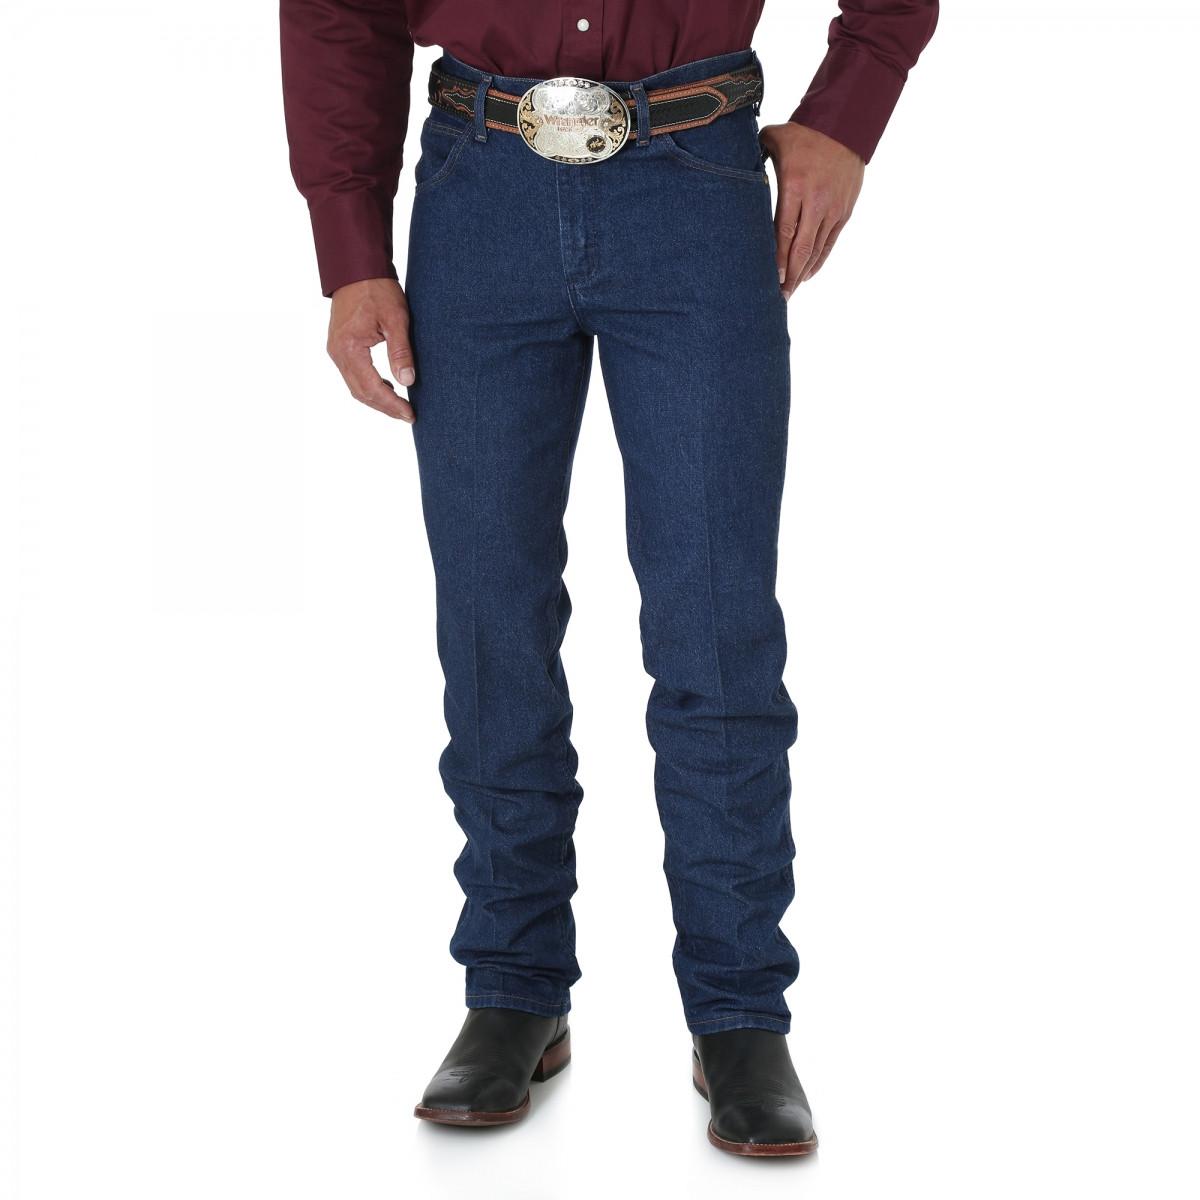 5398b8e1 Premium Performance Cowboy Cut® Slim Fit Jean (36MWZPD) - Archundi ...